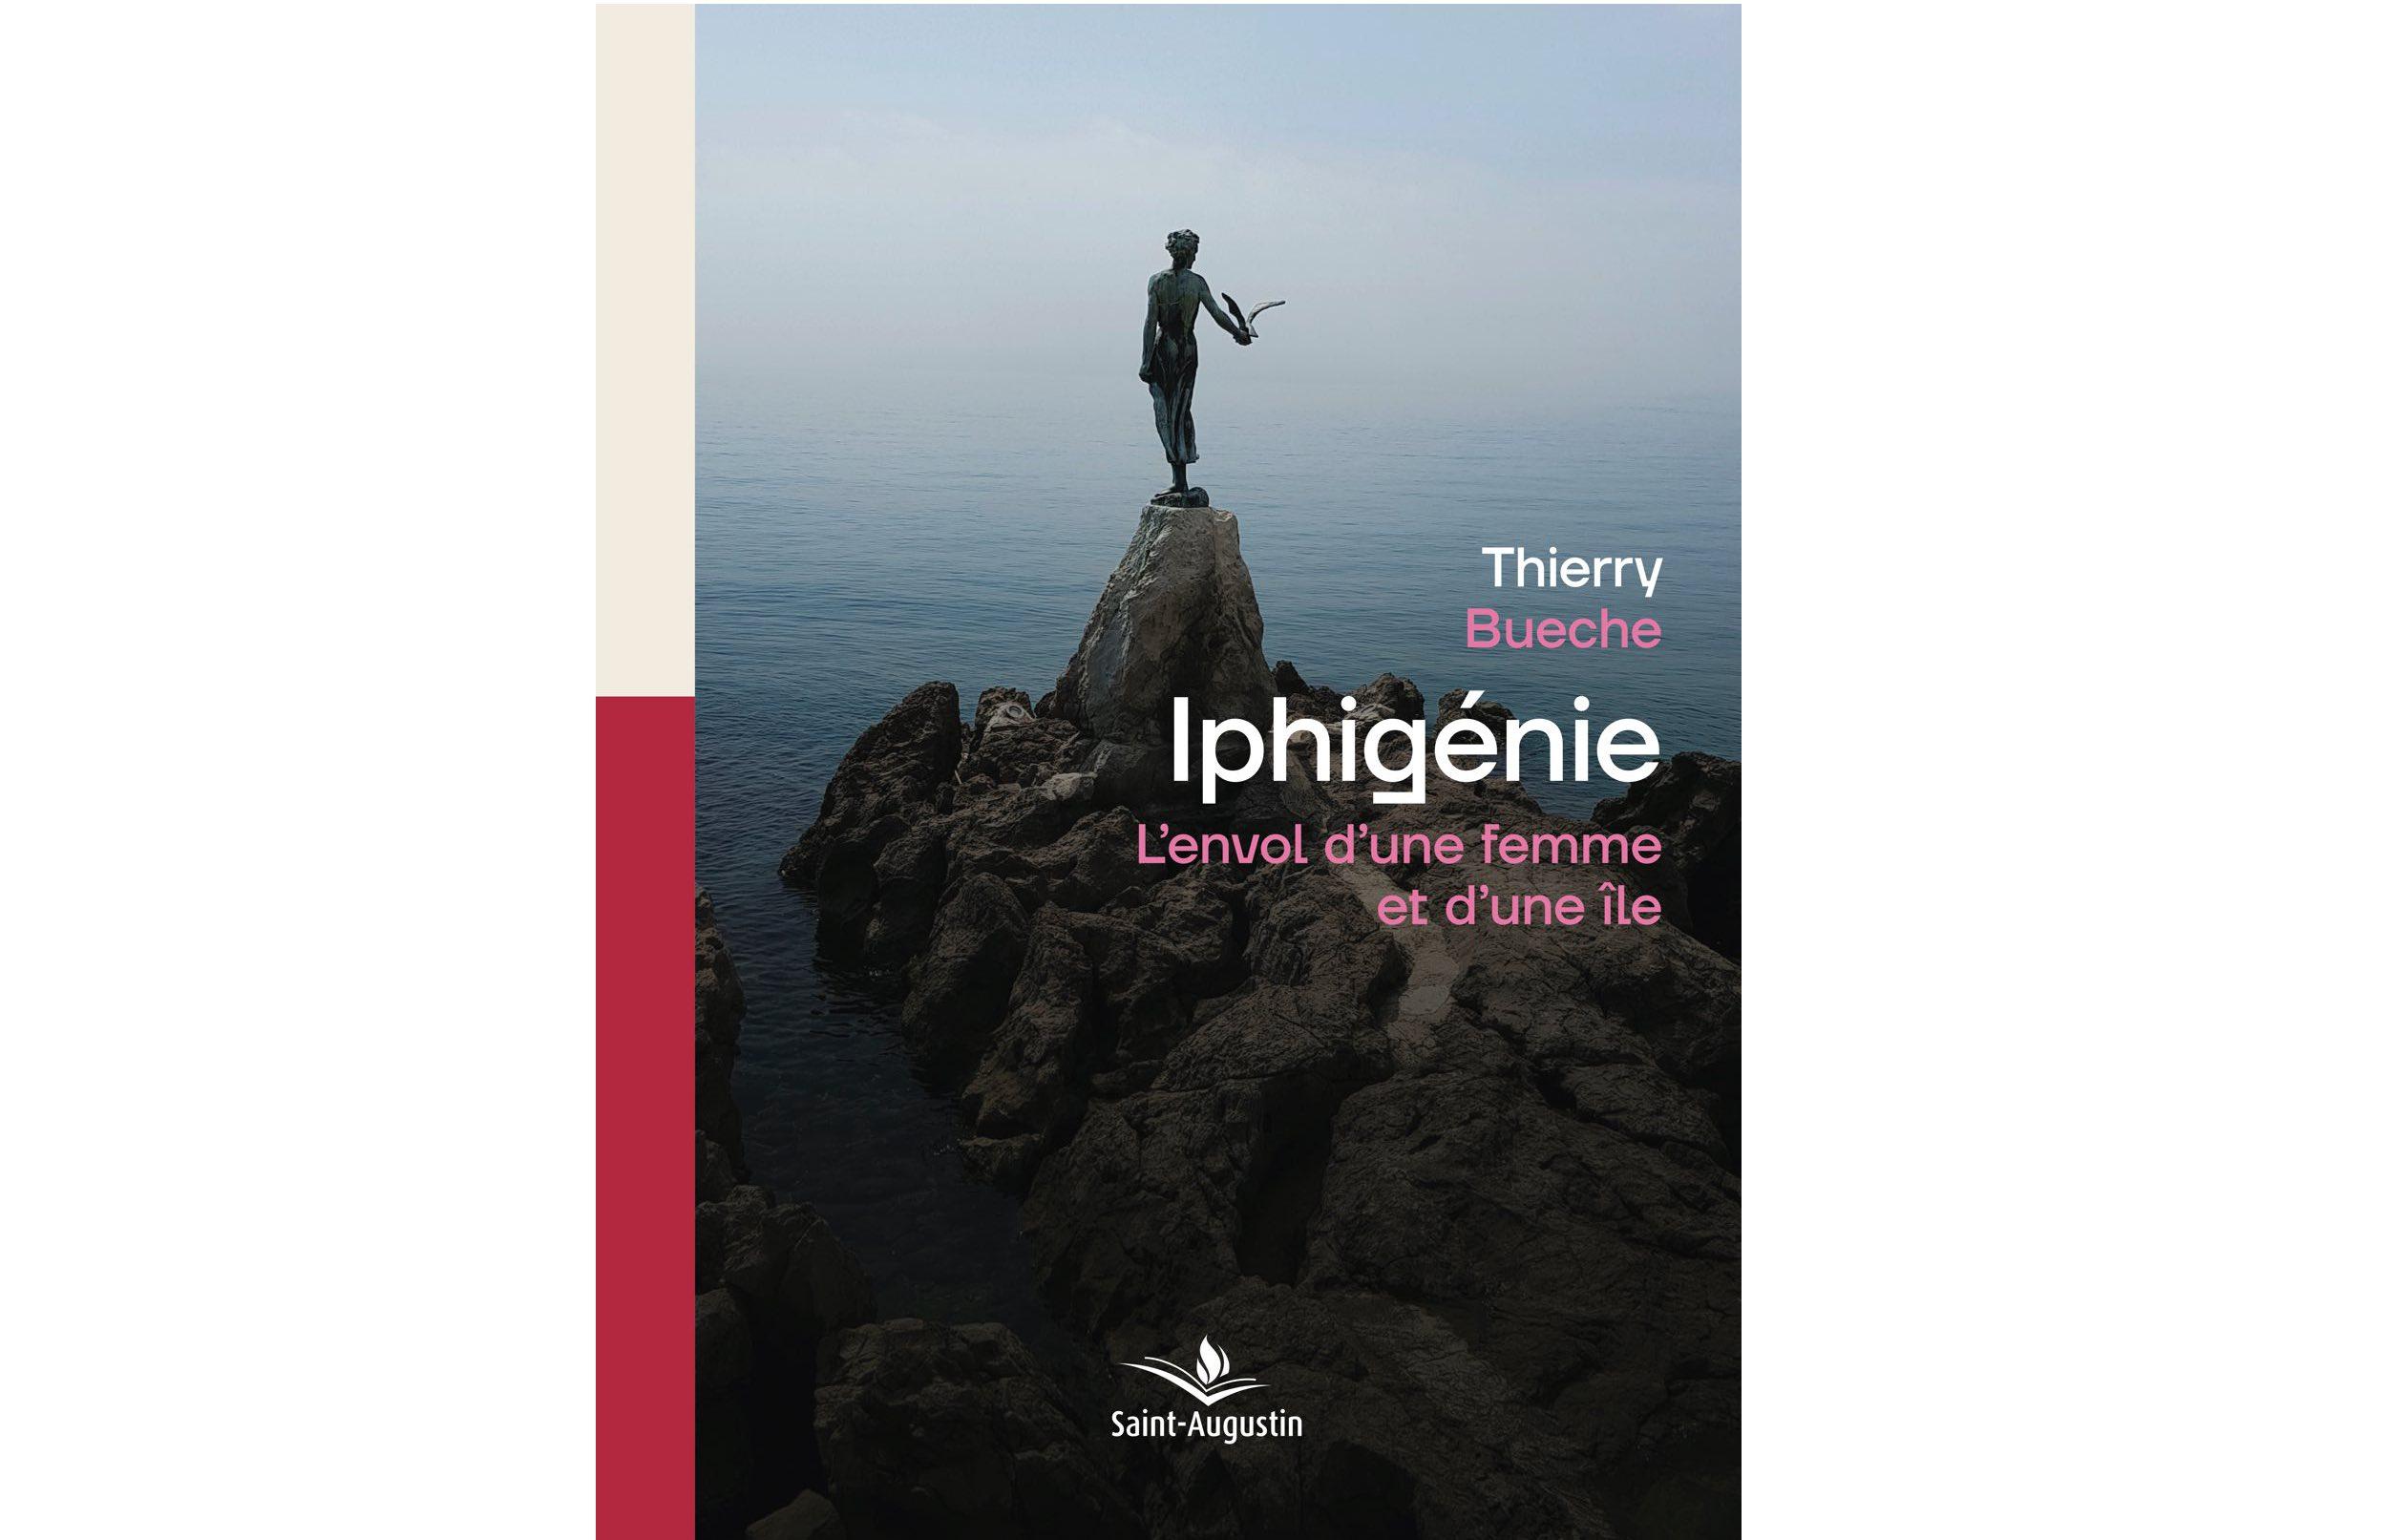 Iphigénie – Thierry Bueche